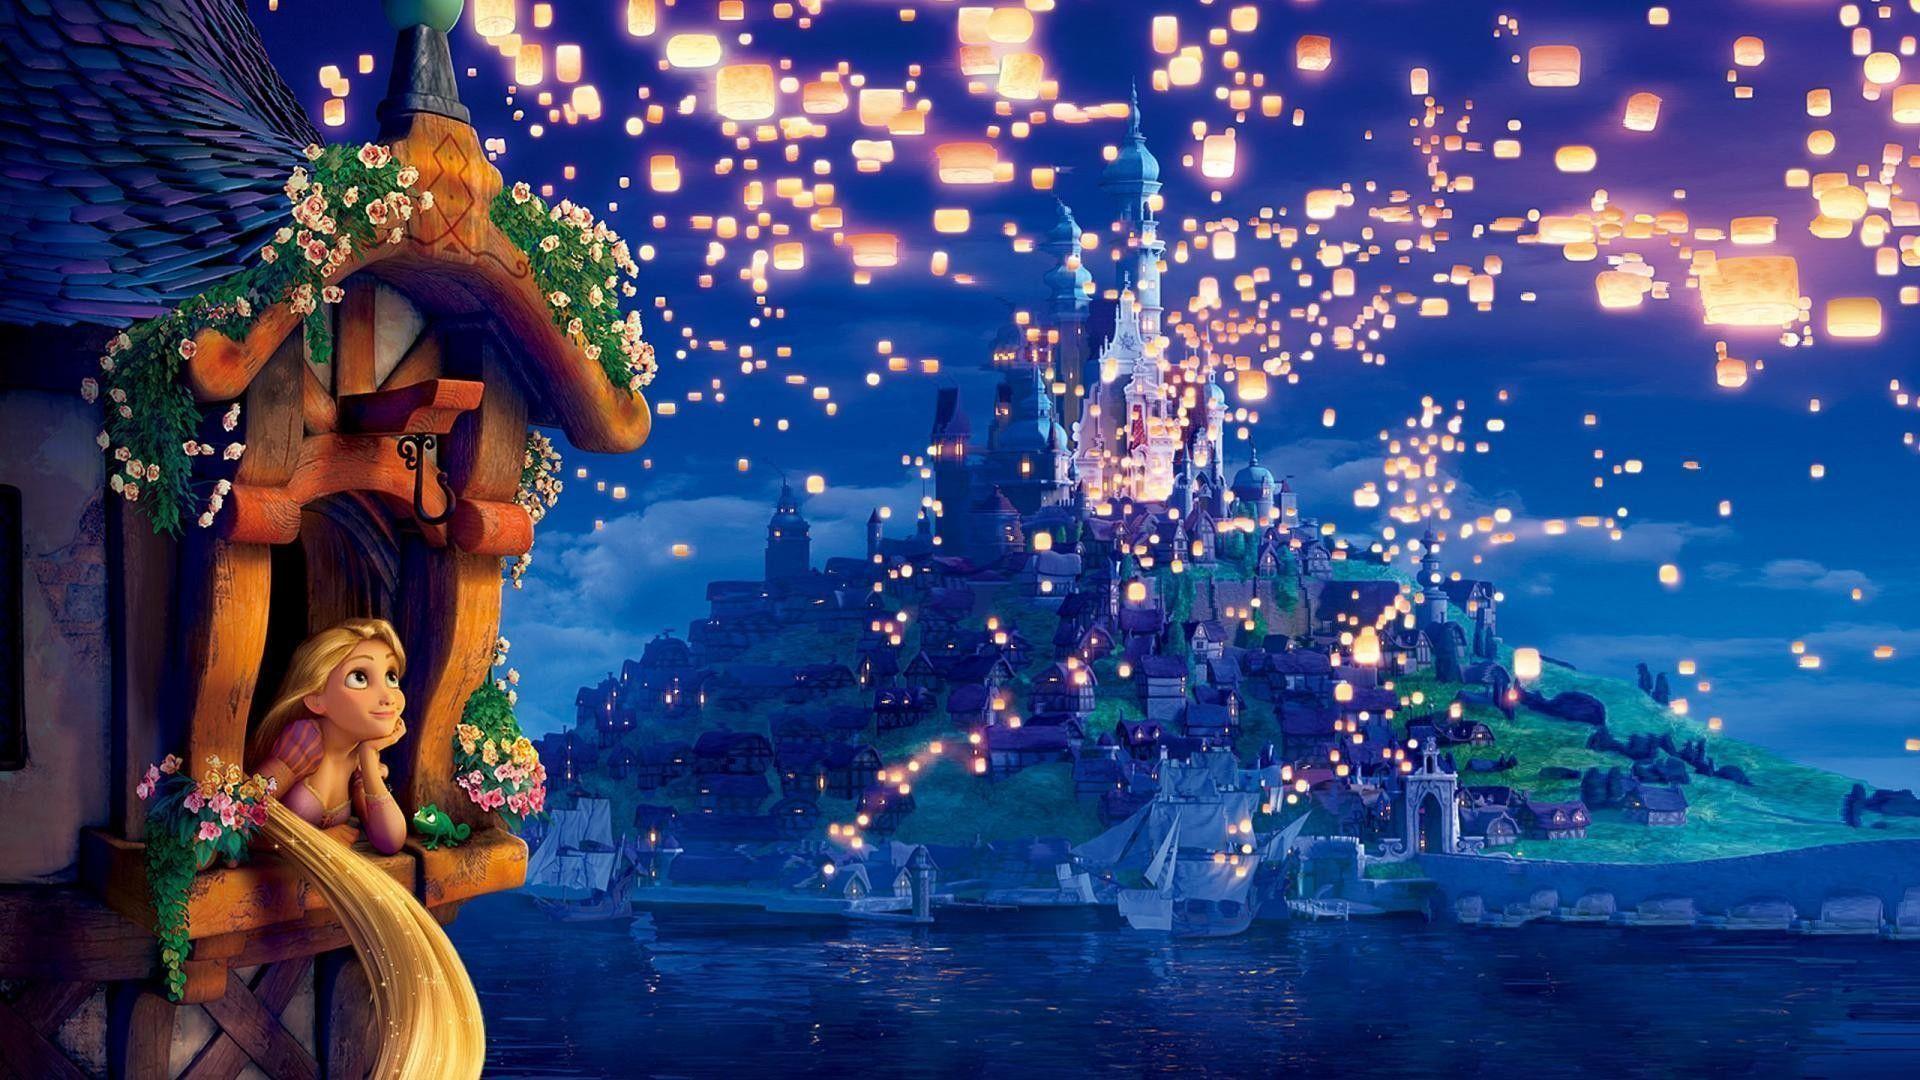 Tangled Wallpapers Disney Desktop Wallpaper Kinkade Disney Thomas Kinkade Disney